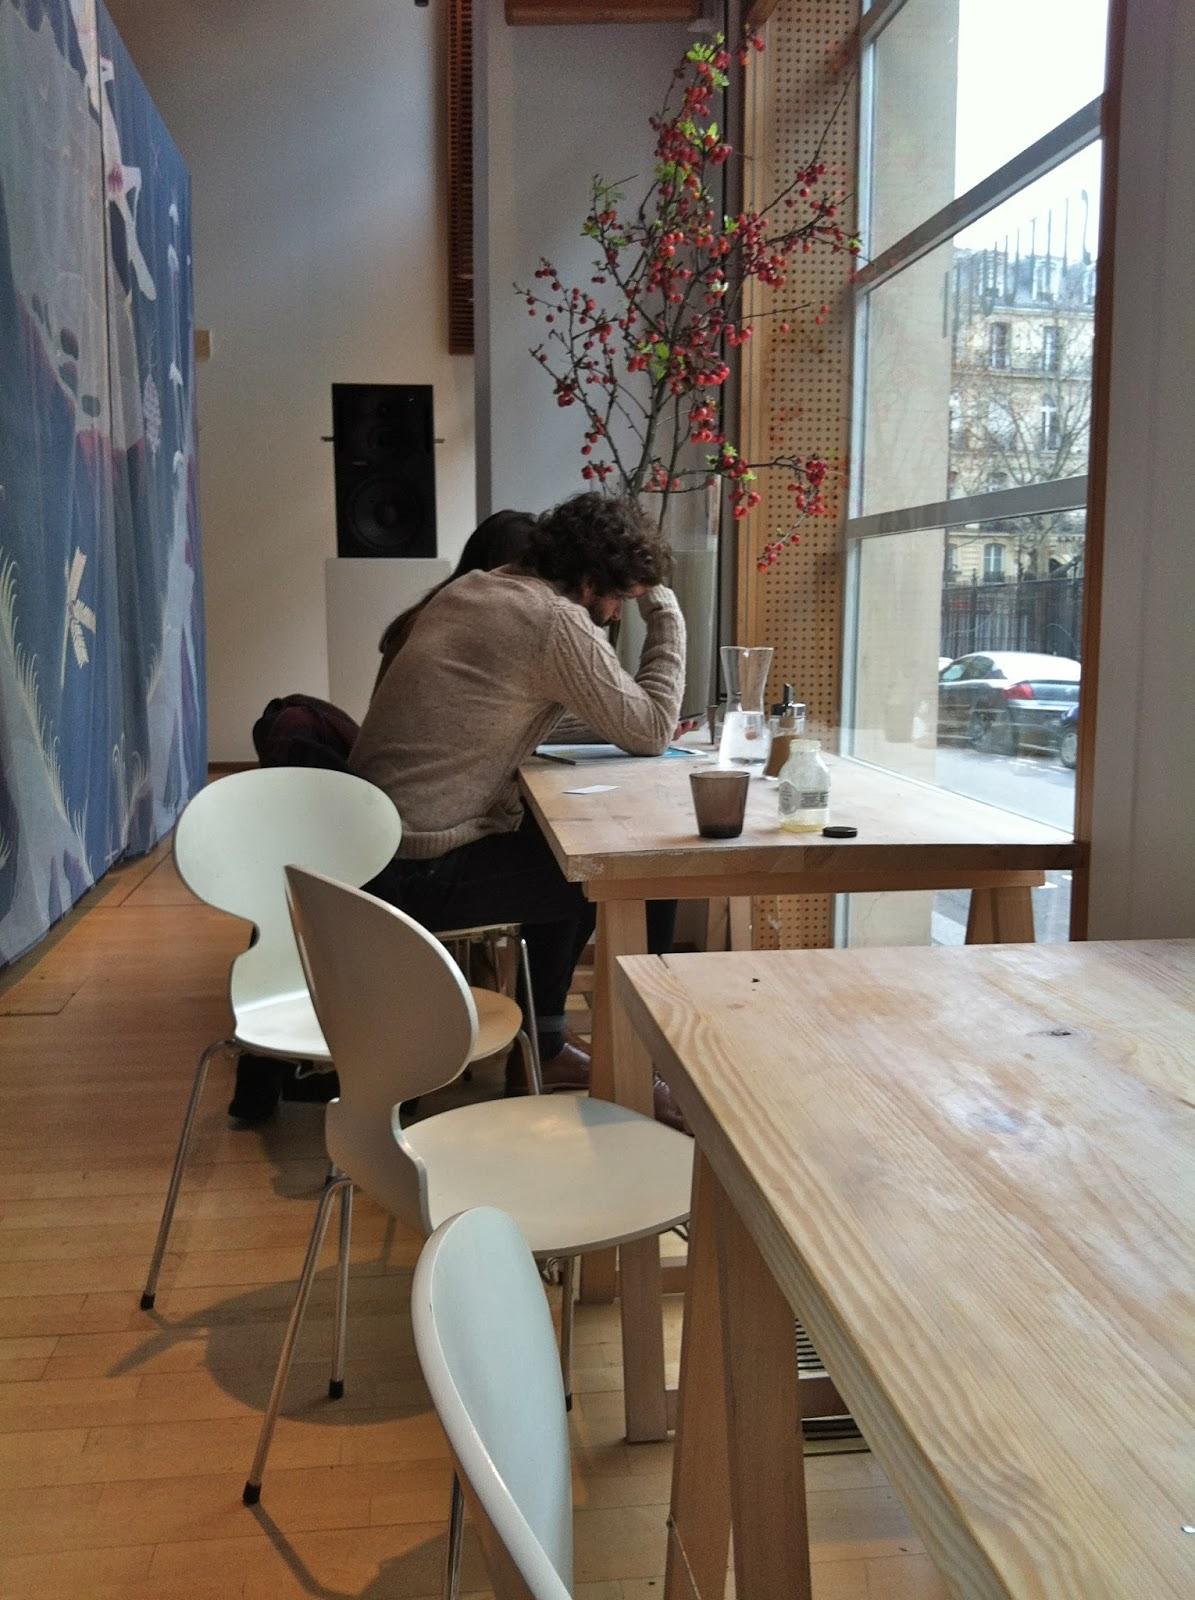 caf coutume institut finlandais paris. Black Bedroom Furniture Sets. Home Design Ideas